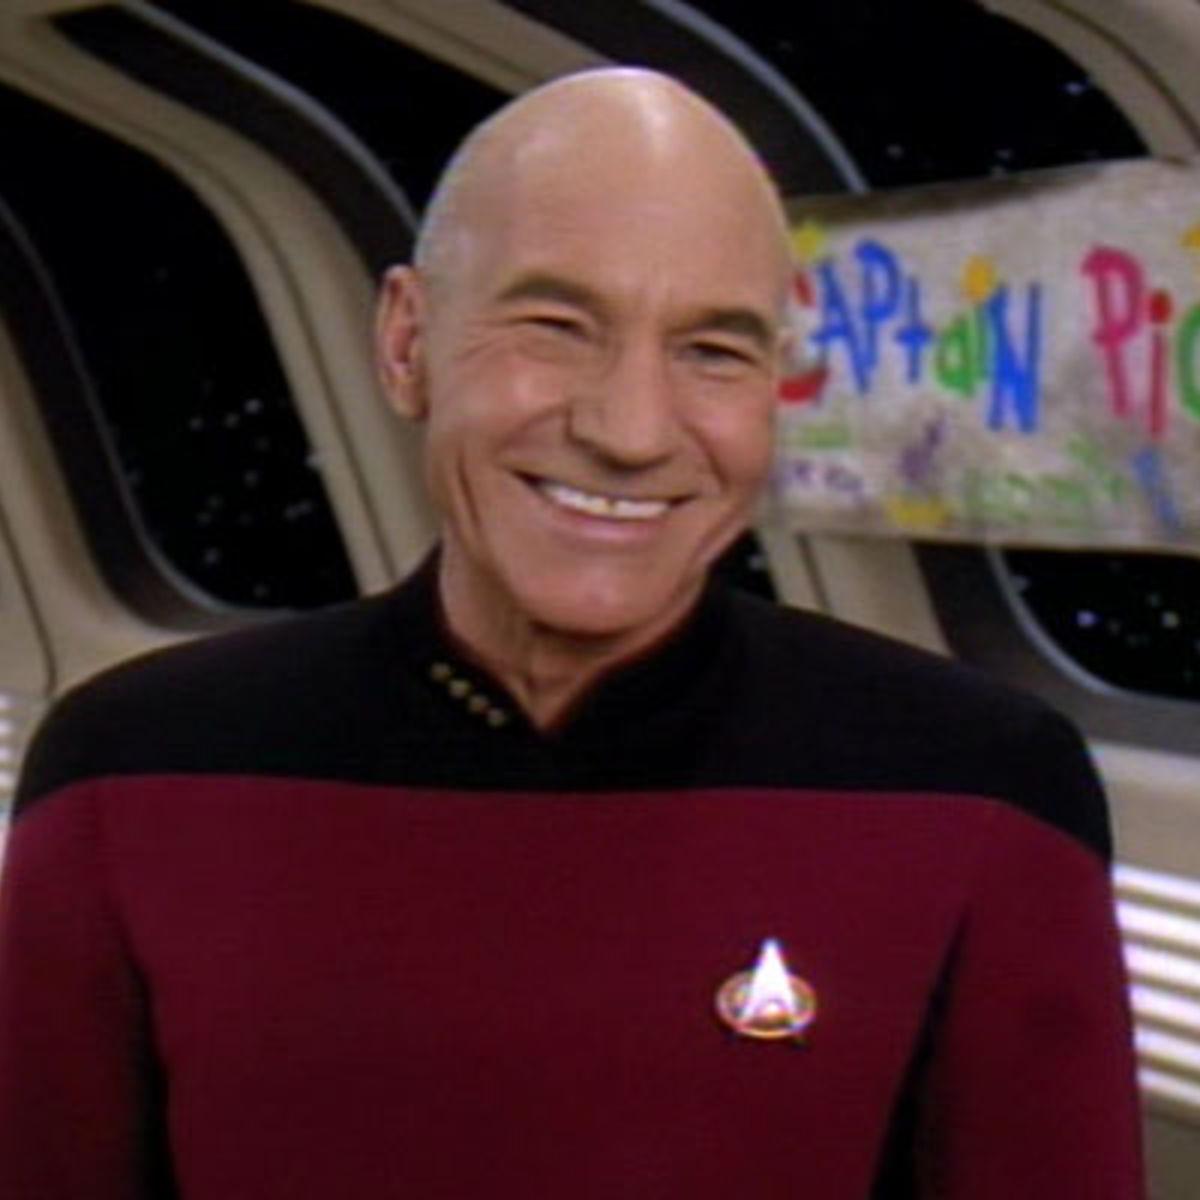 captain-picard-day.jpg